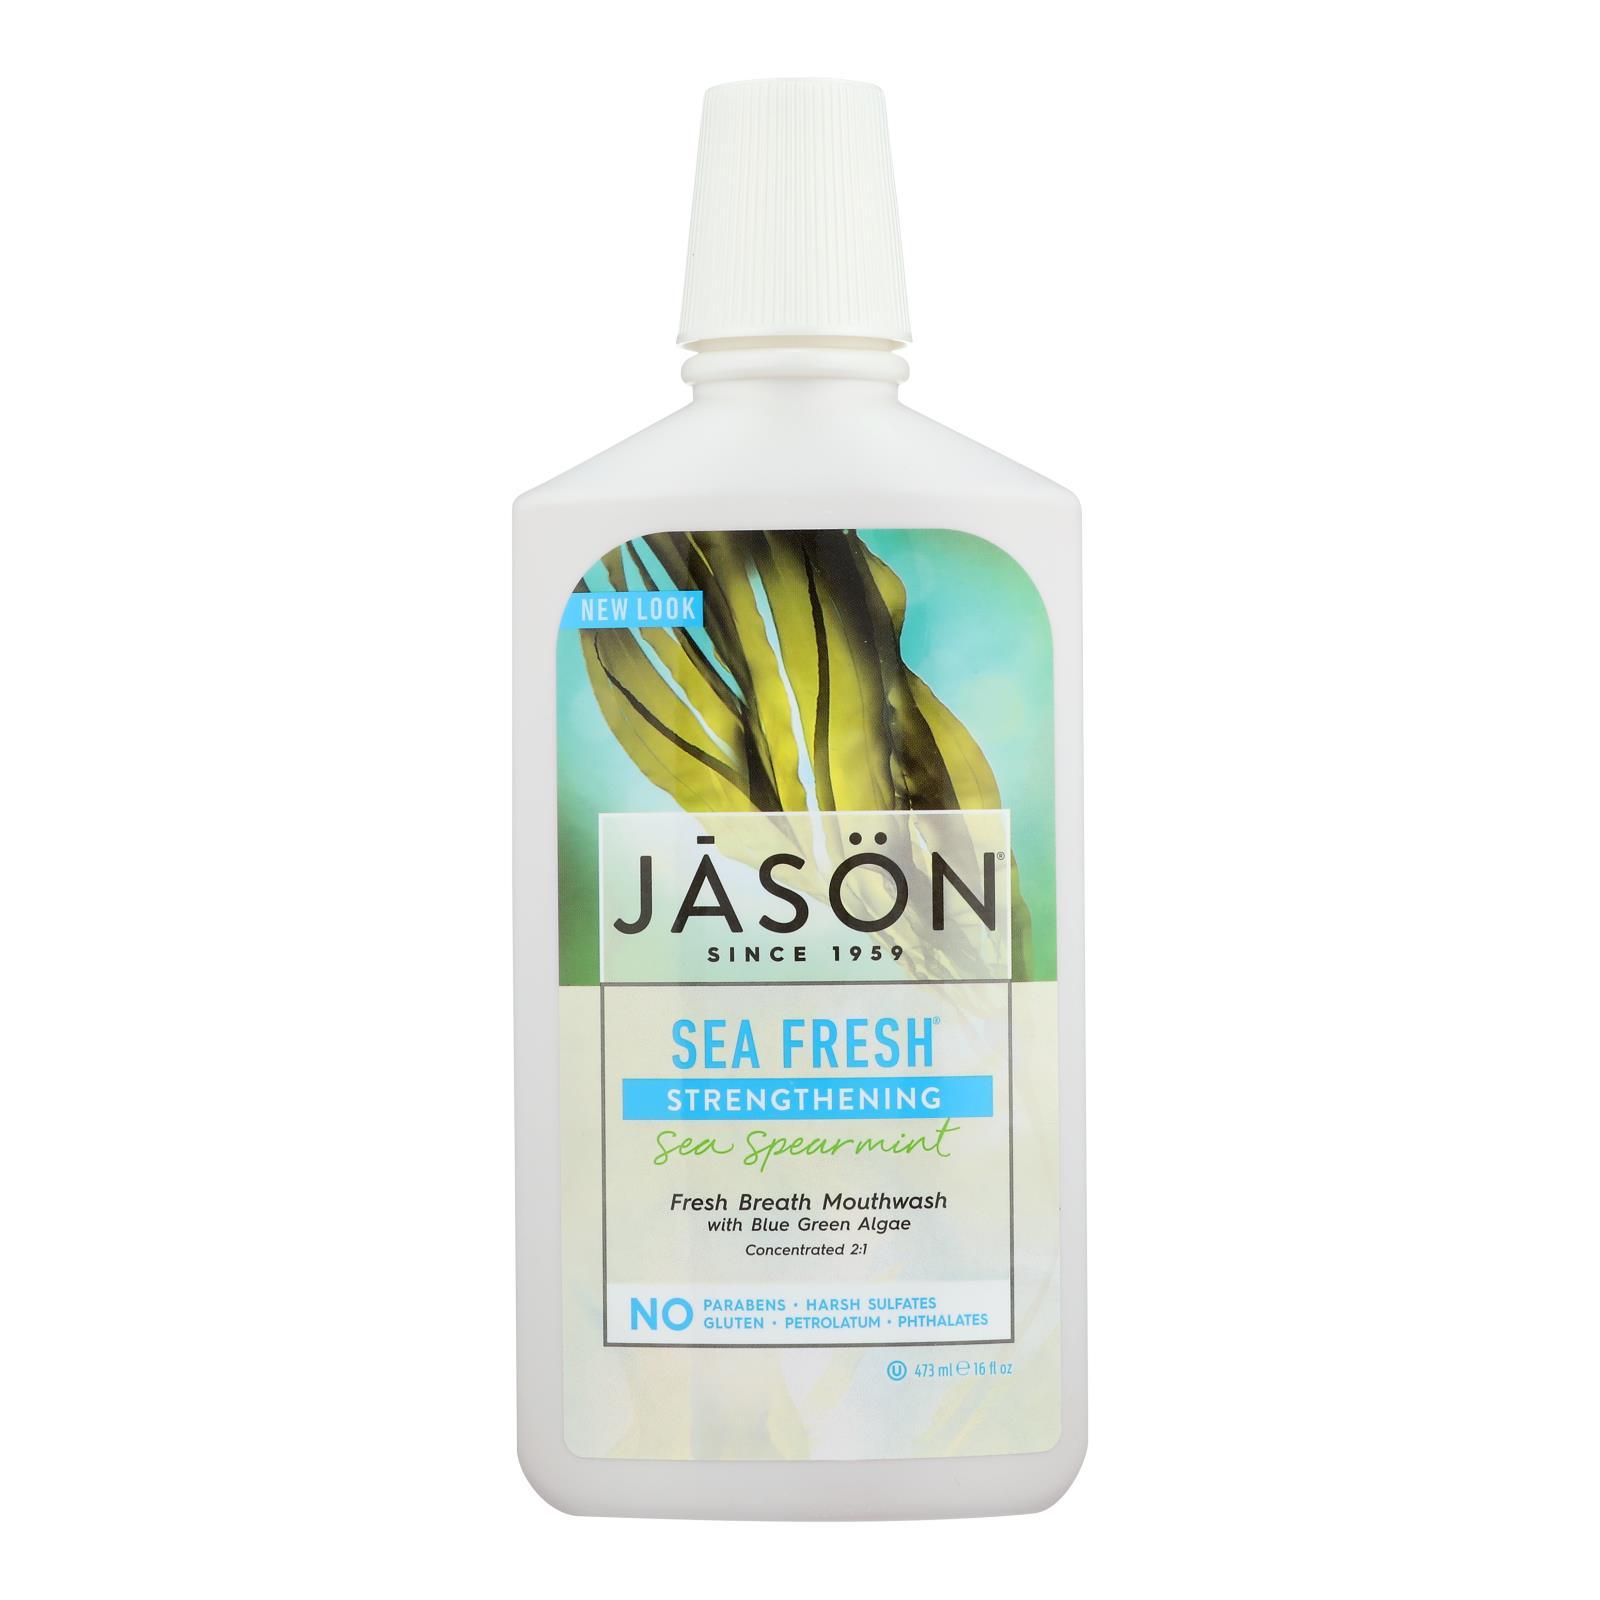 Jason Sea Fresh Biologically Active Mouthwash Deep Sea Spearmint - 16 fl oz